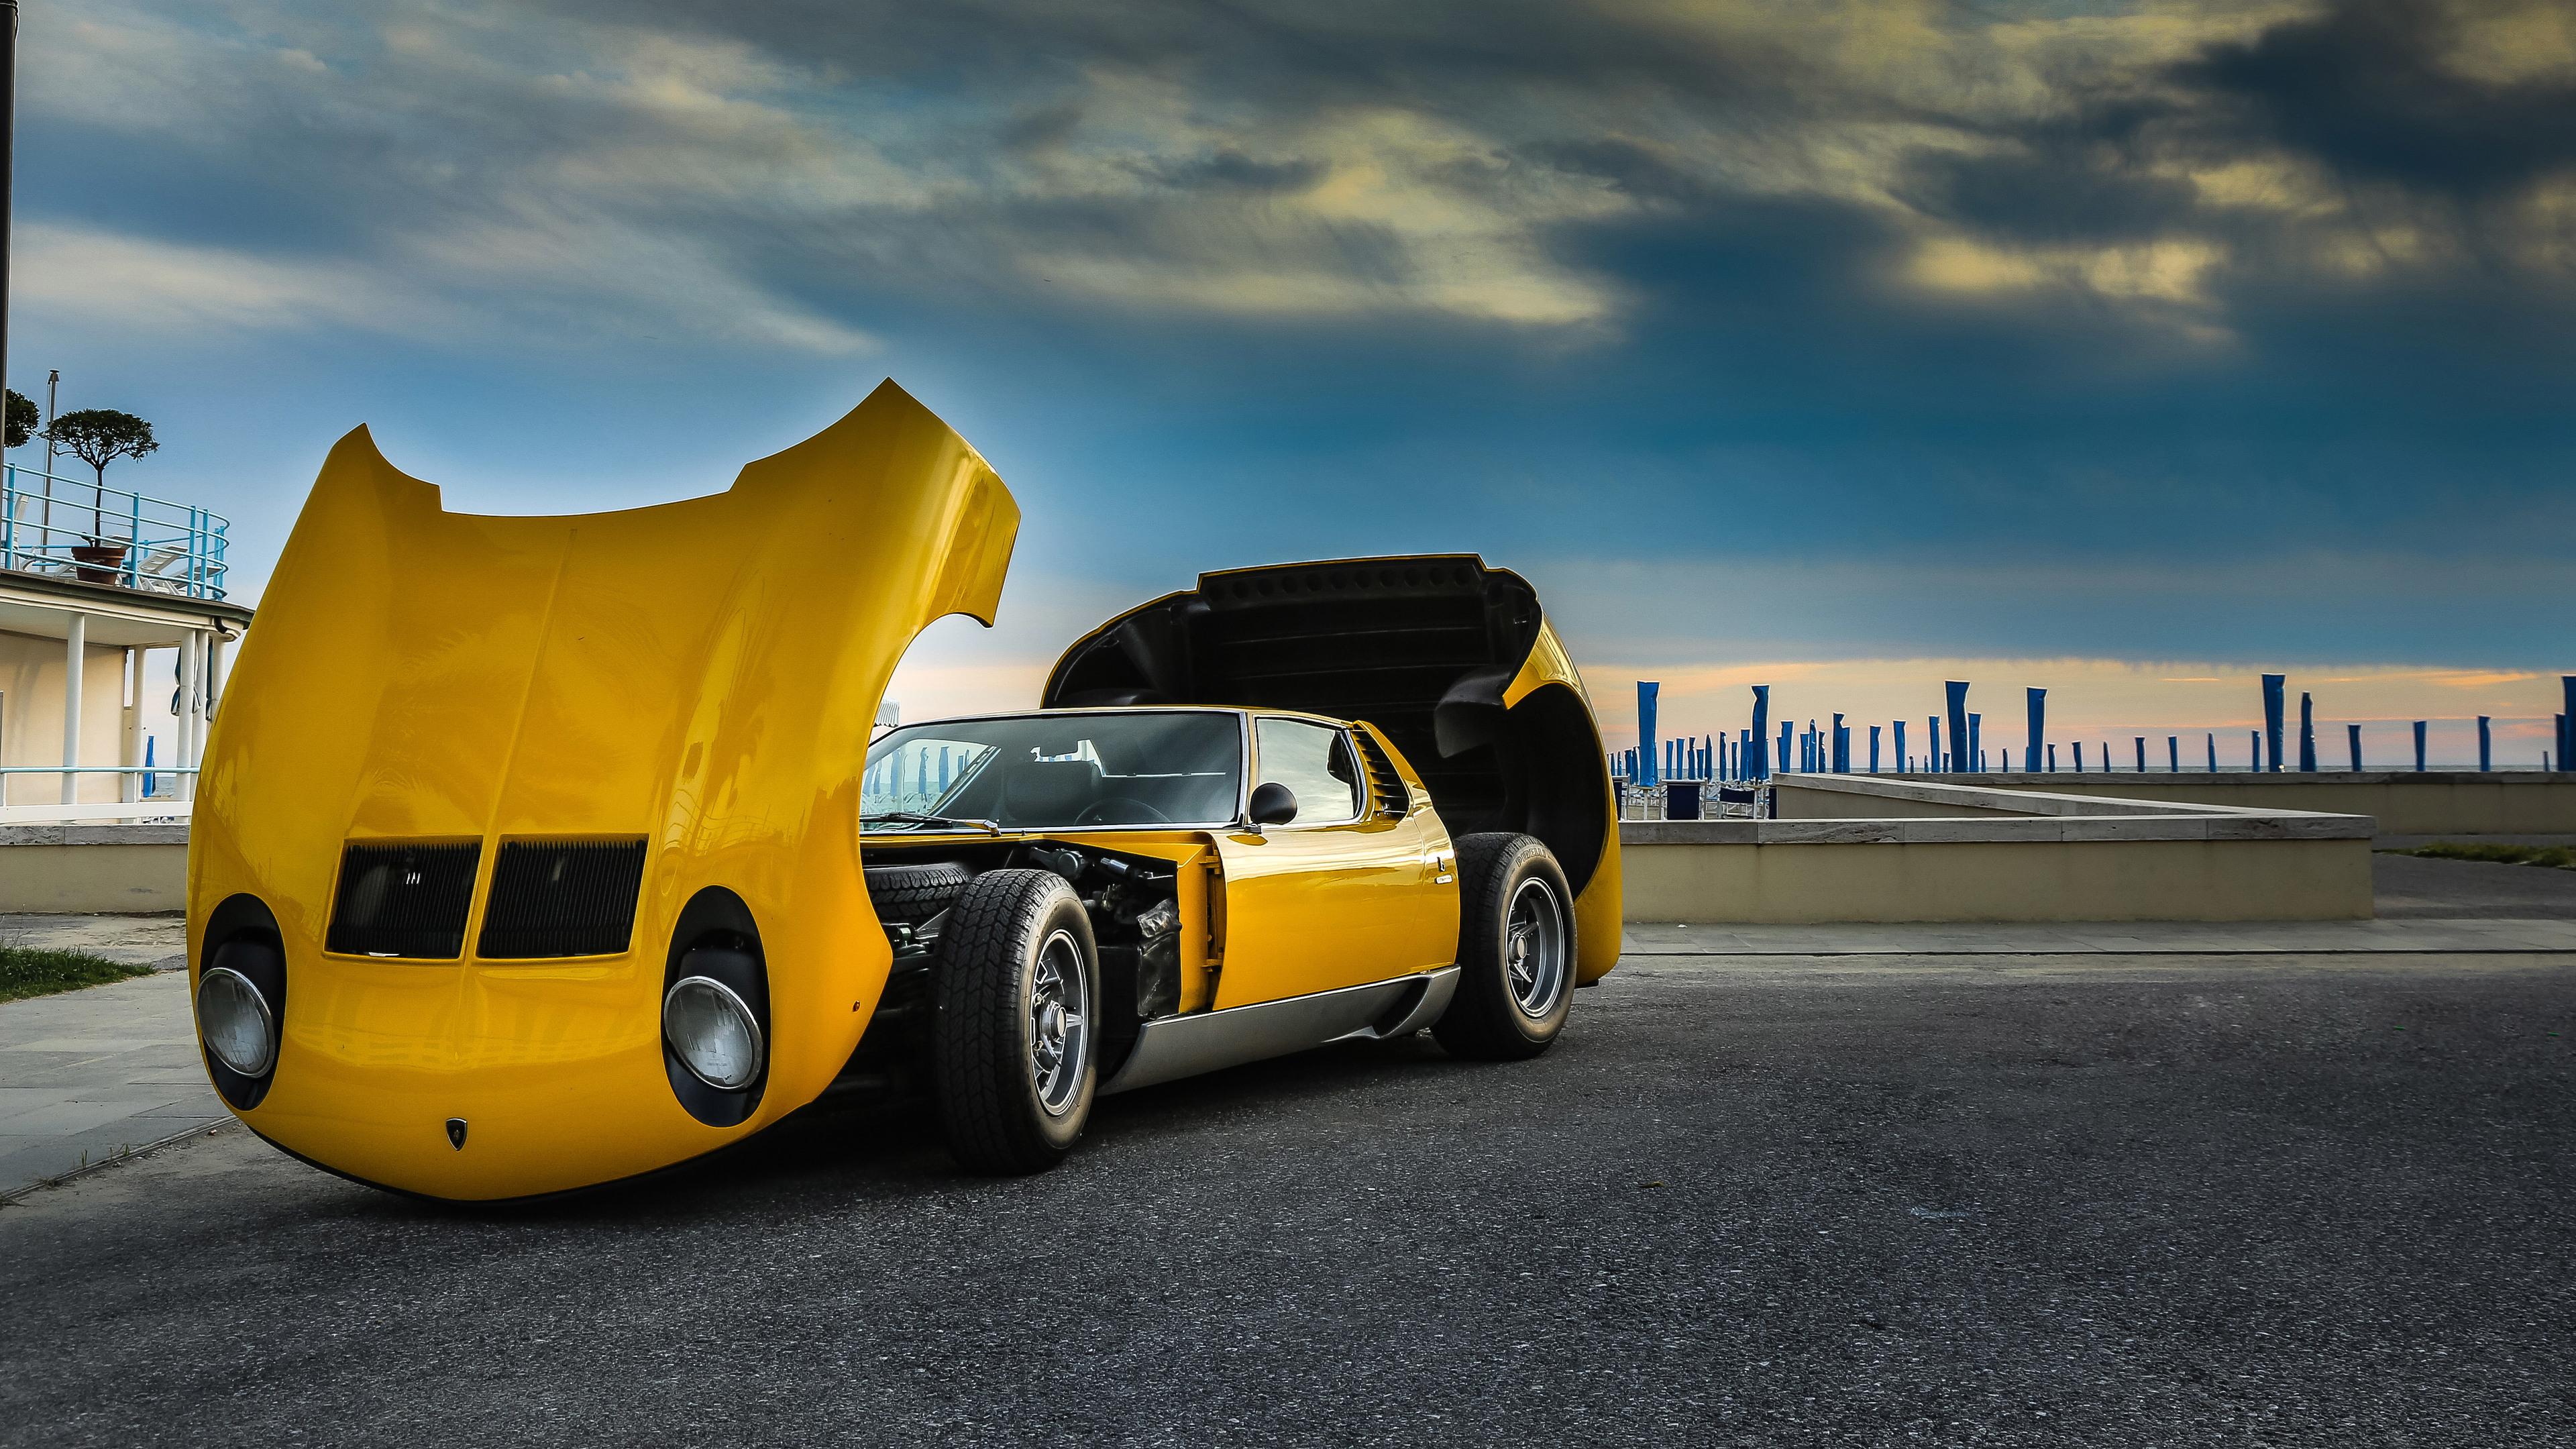 yellow sport car front bonnet 4k 1554245144 - Yellow Sport Car Front Bonnet 4k - hd-wallpapers, cars wallpapers, 5k wallpapers, 4k-wallpapers